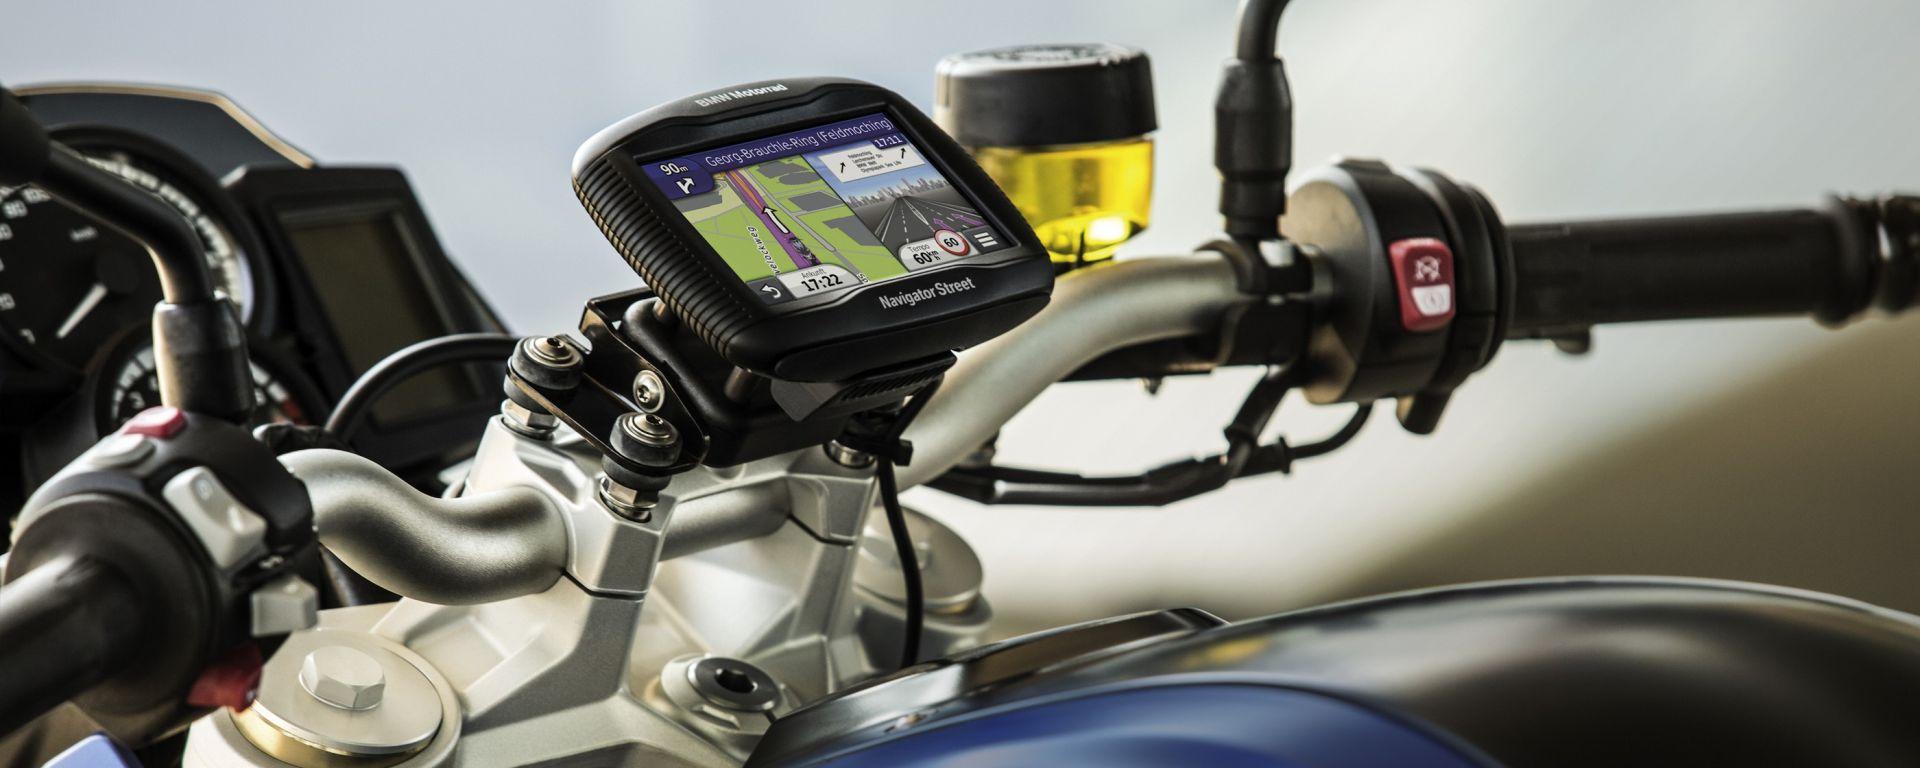 BMW Motorrad: navigatore Street